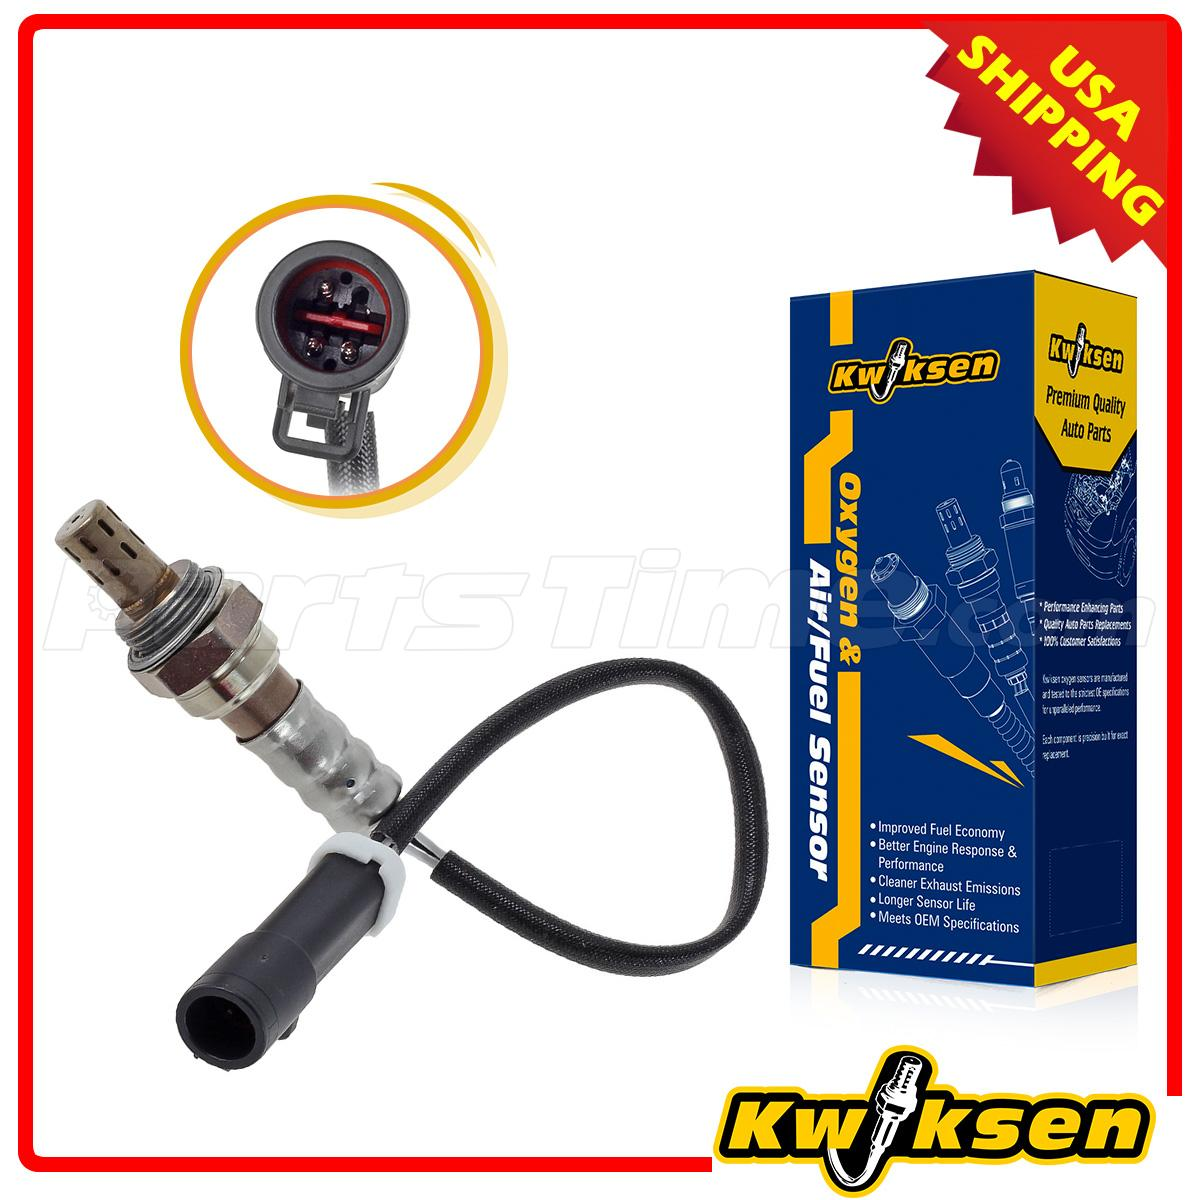 Ford Oxygen Sensor Wiring 1990 Free Diagram For You 02 B18 O2 Upstream 1987 Aerostar Ntk Dodge Nitro Aftermarket